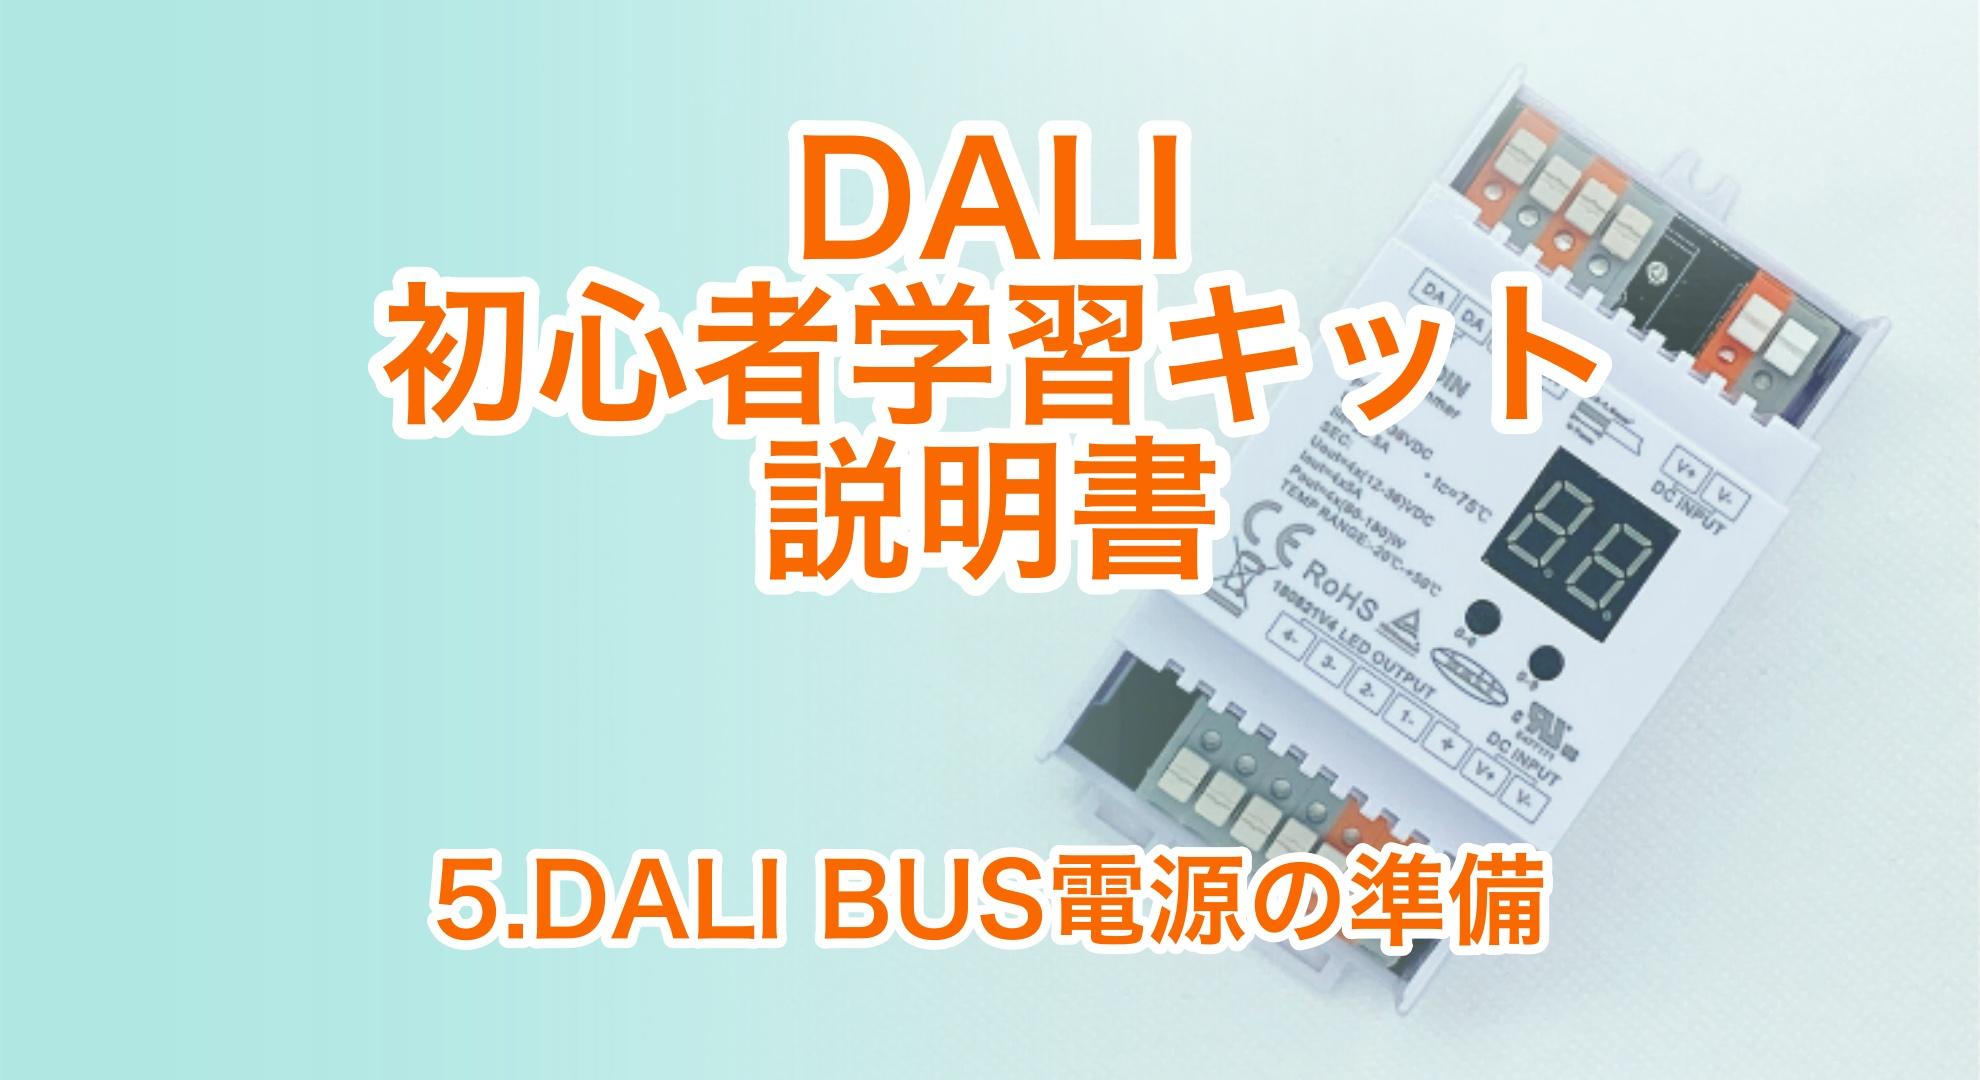 DALI初心者学習キット説明書 5.DALI BUS電源の準備